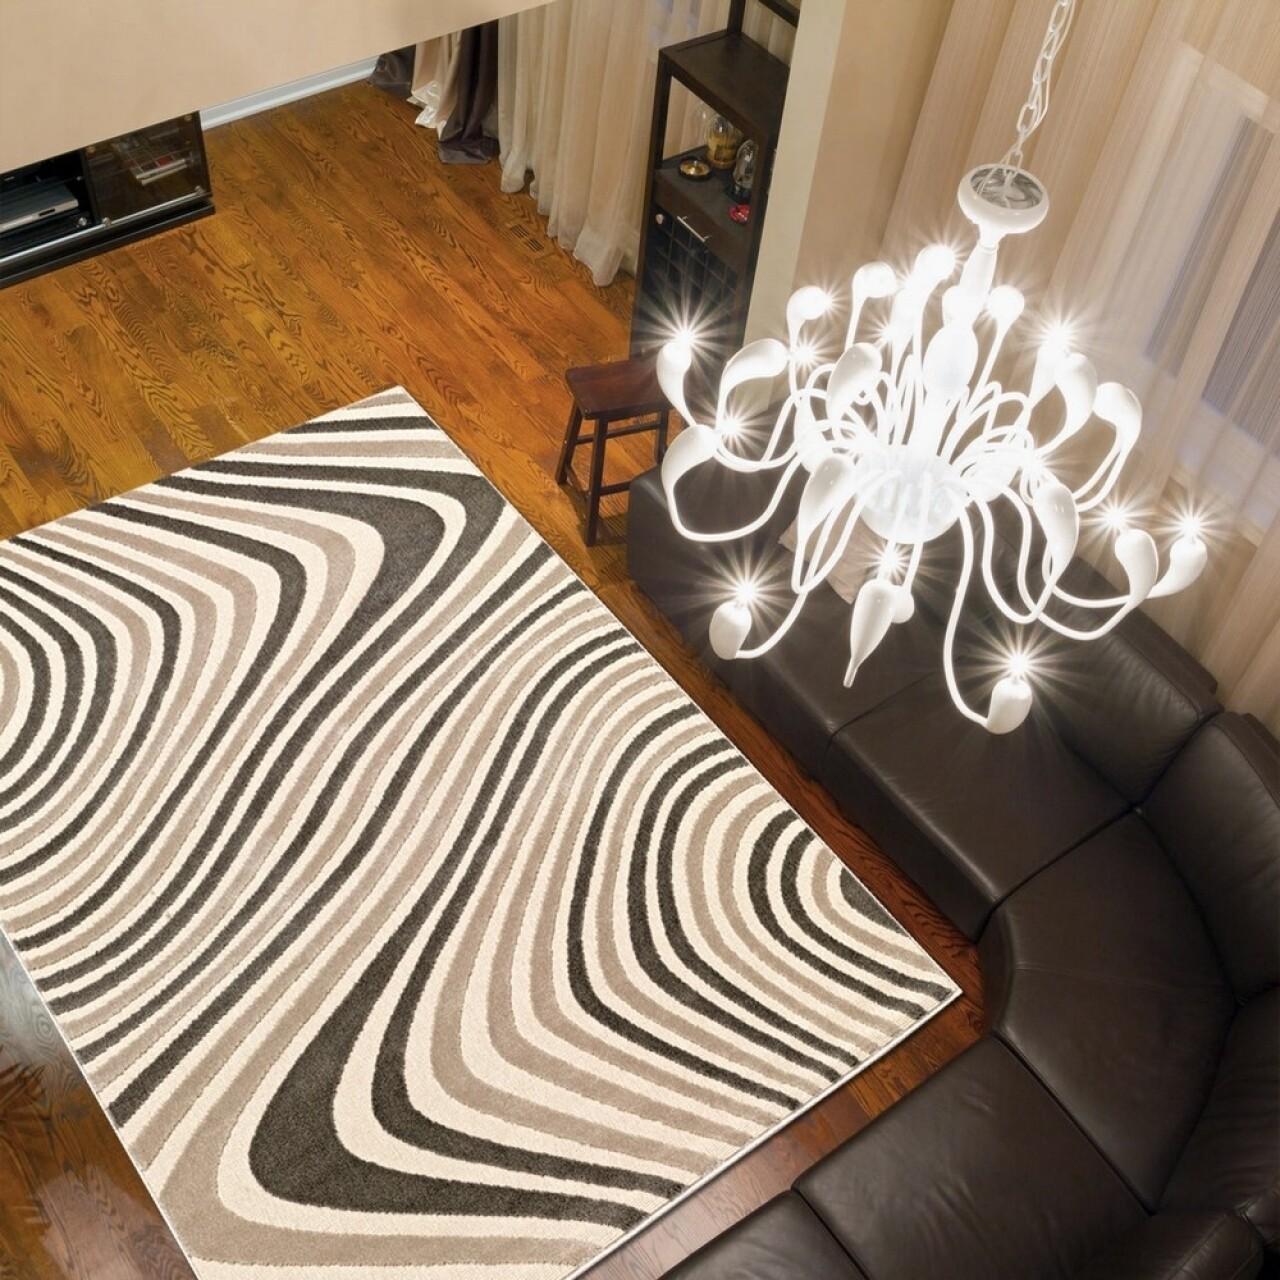 Covor Reflex, Floorita, 140 x 200 cm, 100% polipropilena, bej/maro